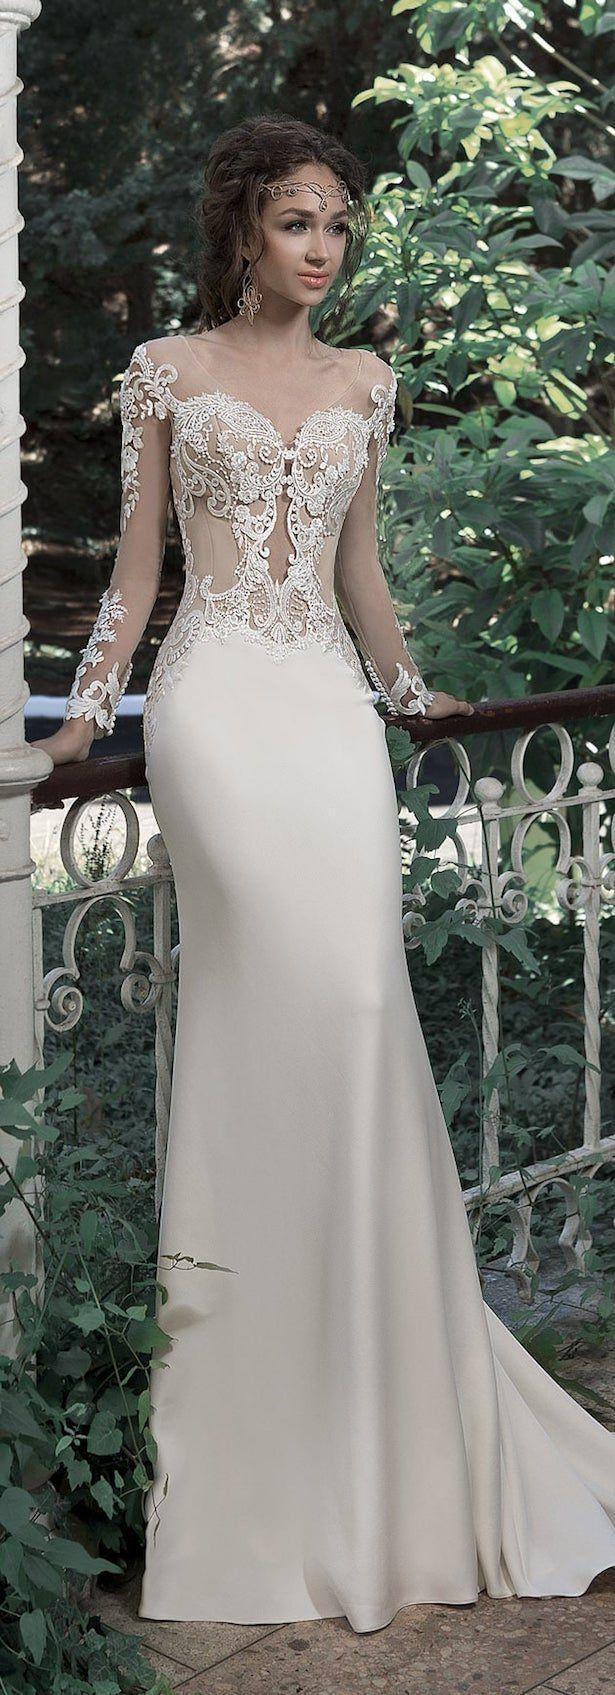 330 best Wedding Dresses images on Pinterest | Wedding dressses ...